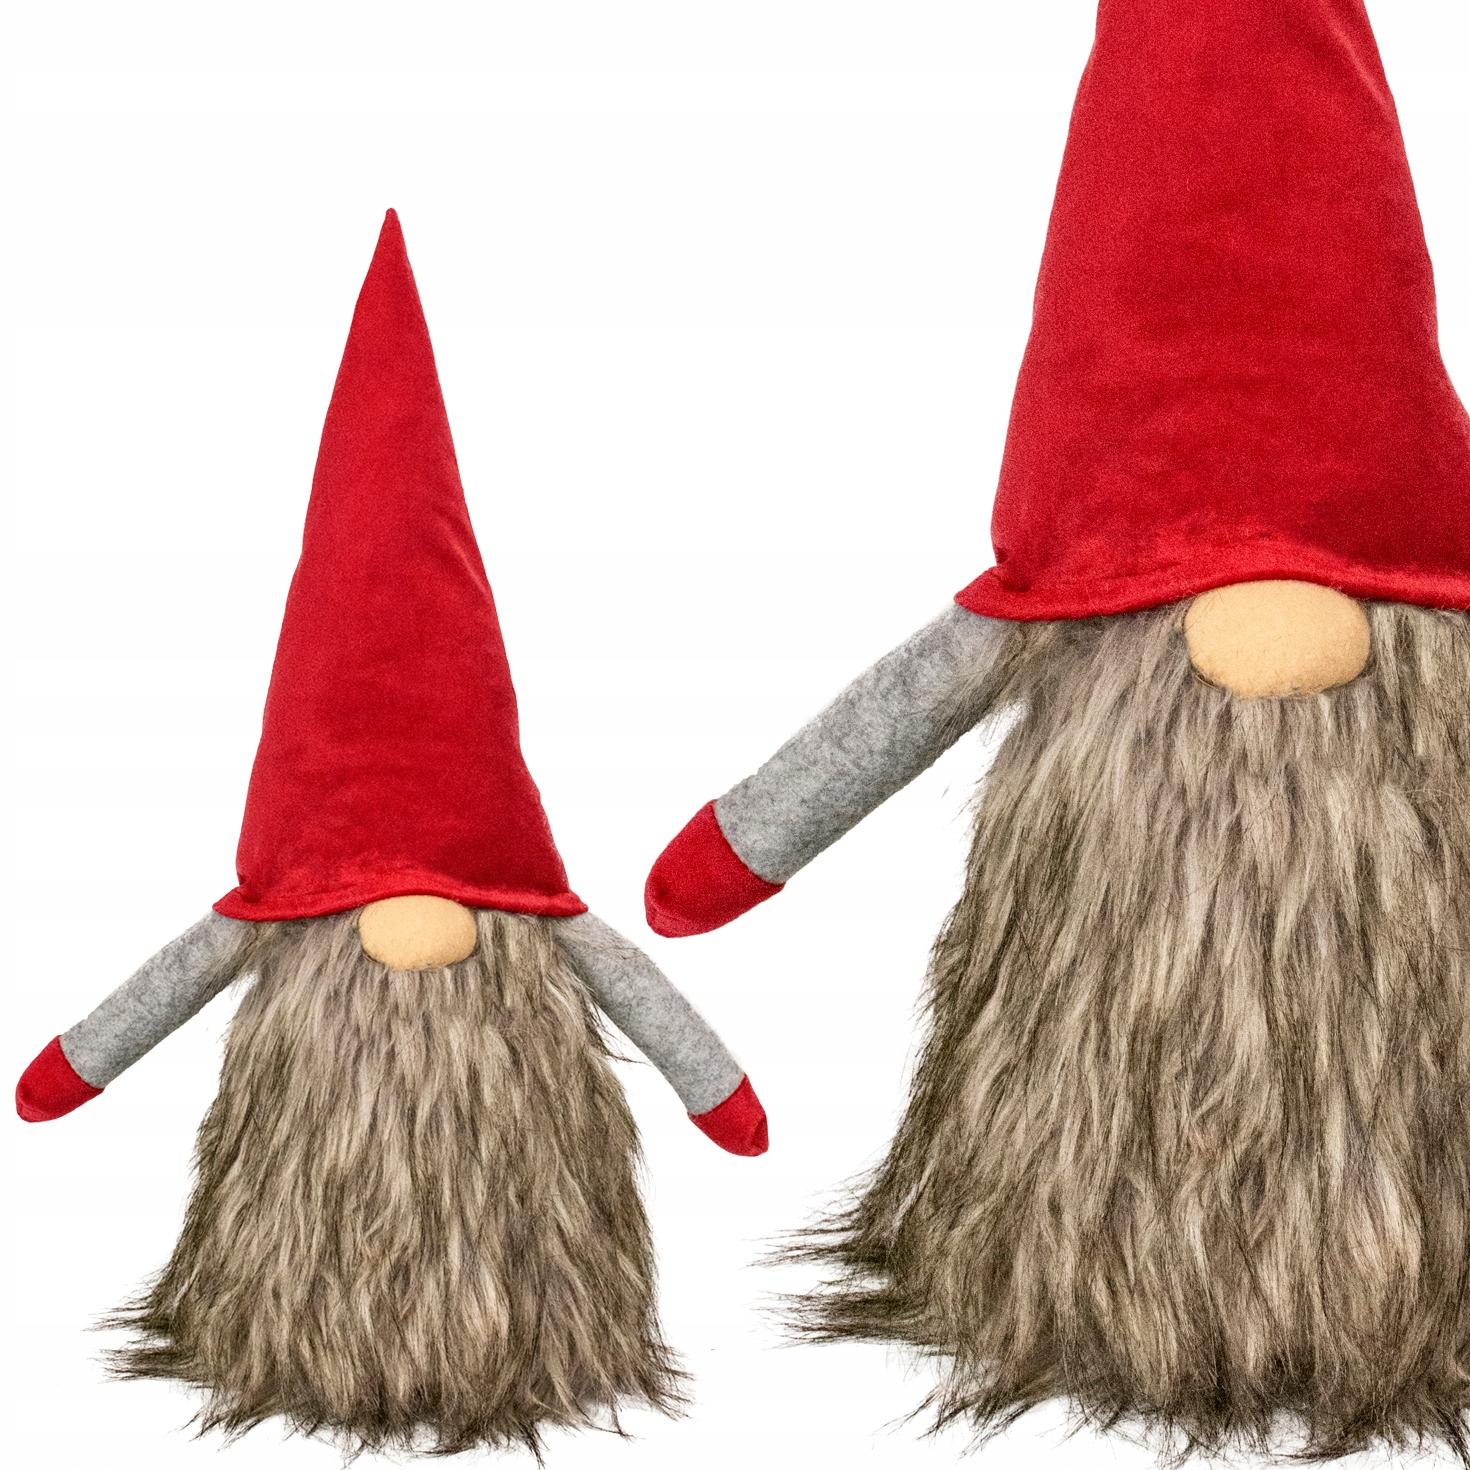 ГАЛЕРЕЯ Christmas Gnome Gnome 48см Меховая борода